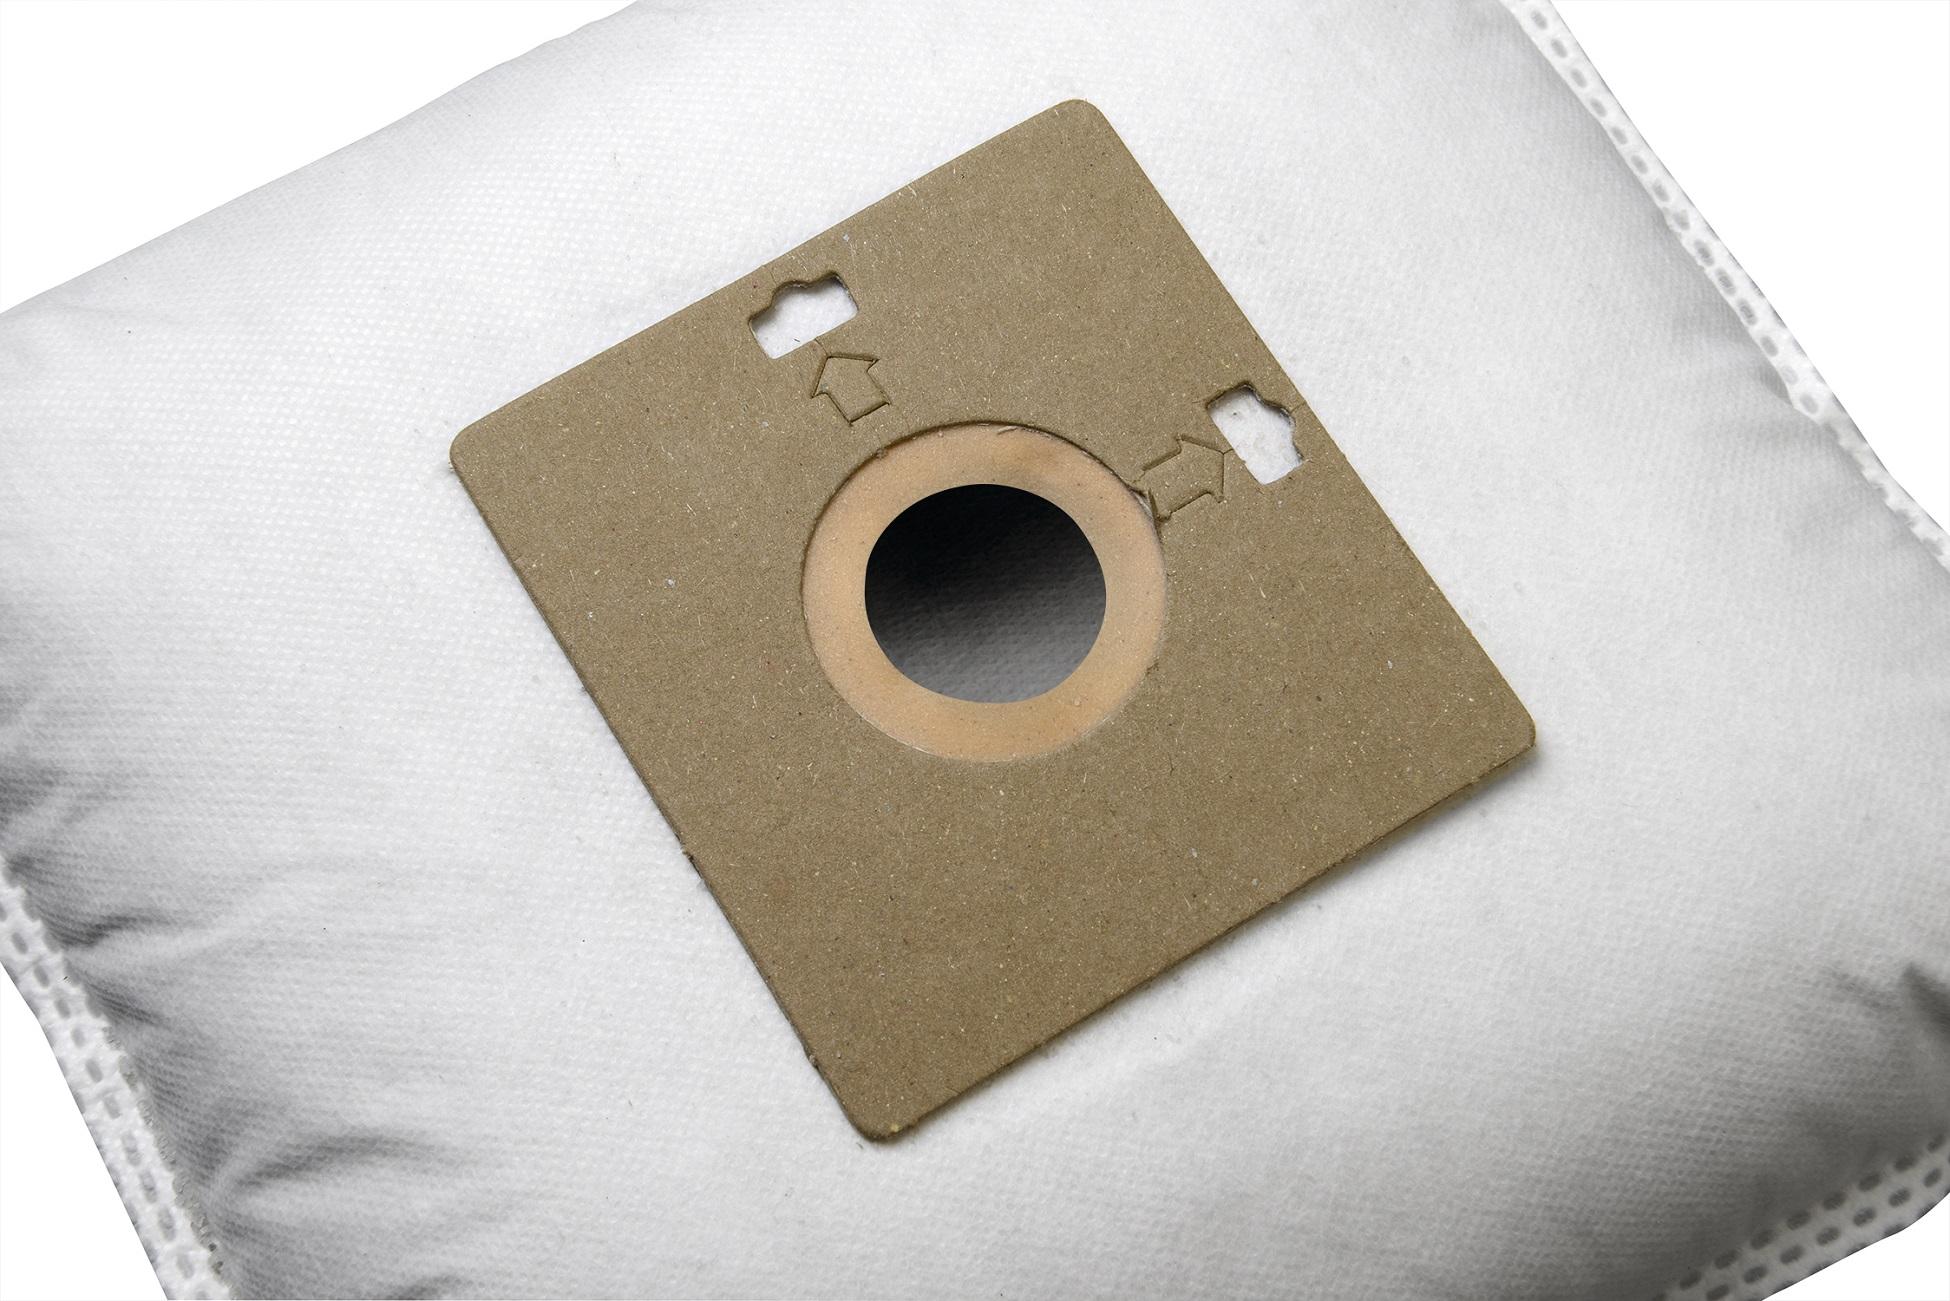 KOMA ET36 - SMART BAG - Concept, ETA, Sencor, textilní, 5ks